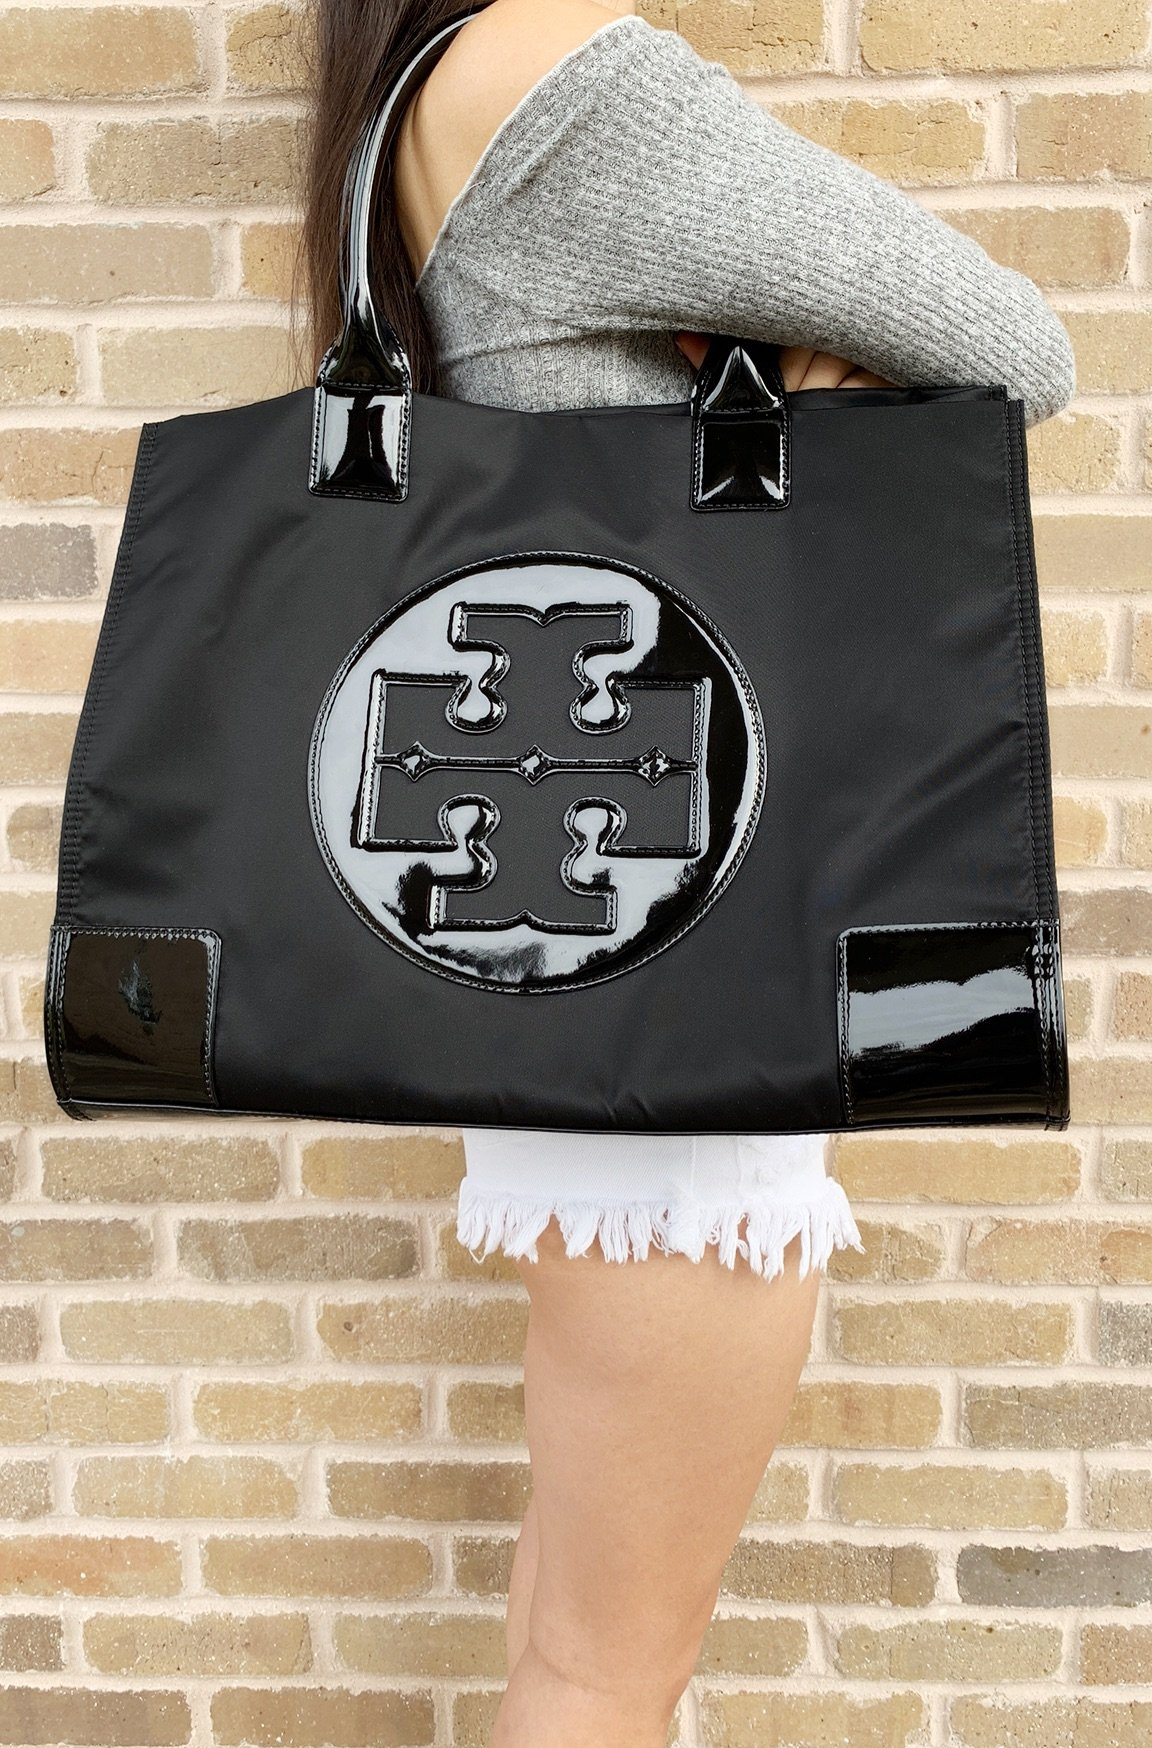 bd074fc5c27 Tory Burch Ella Large Tote Black Nylon Patent Leather 885427179320 ...